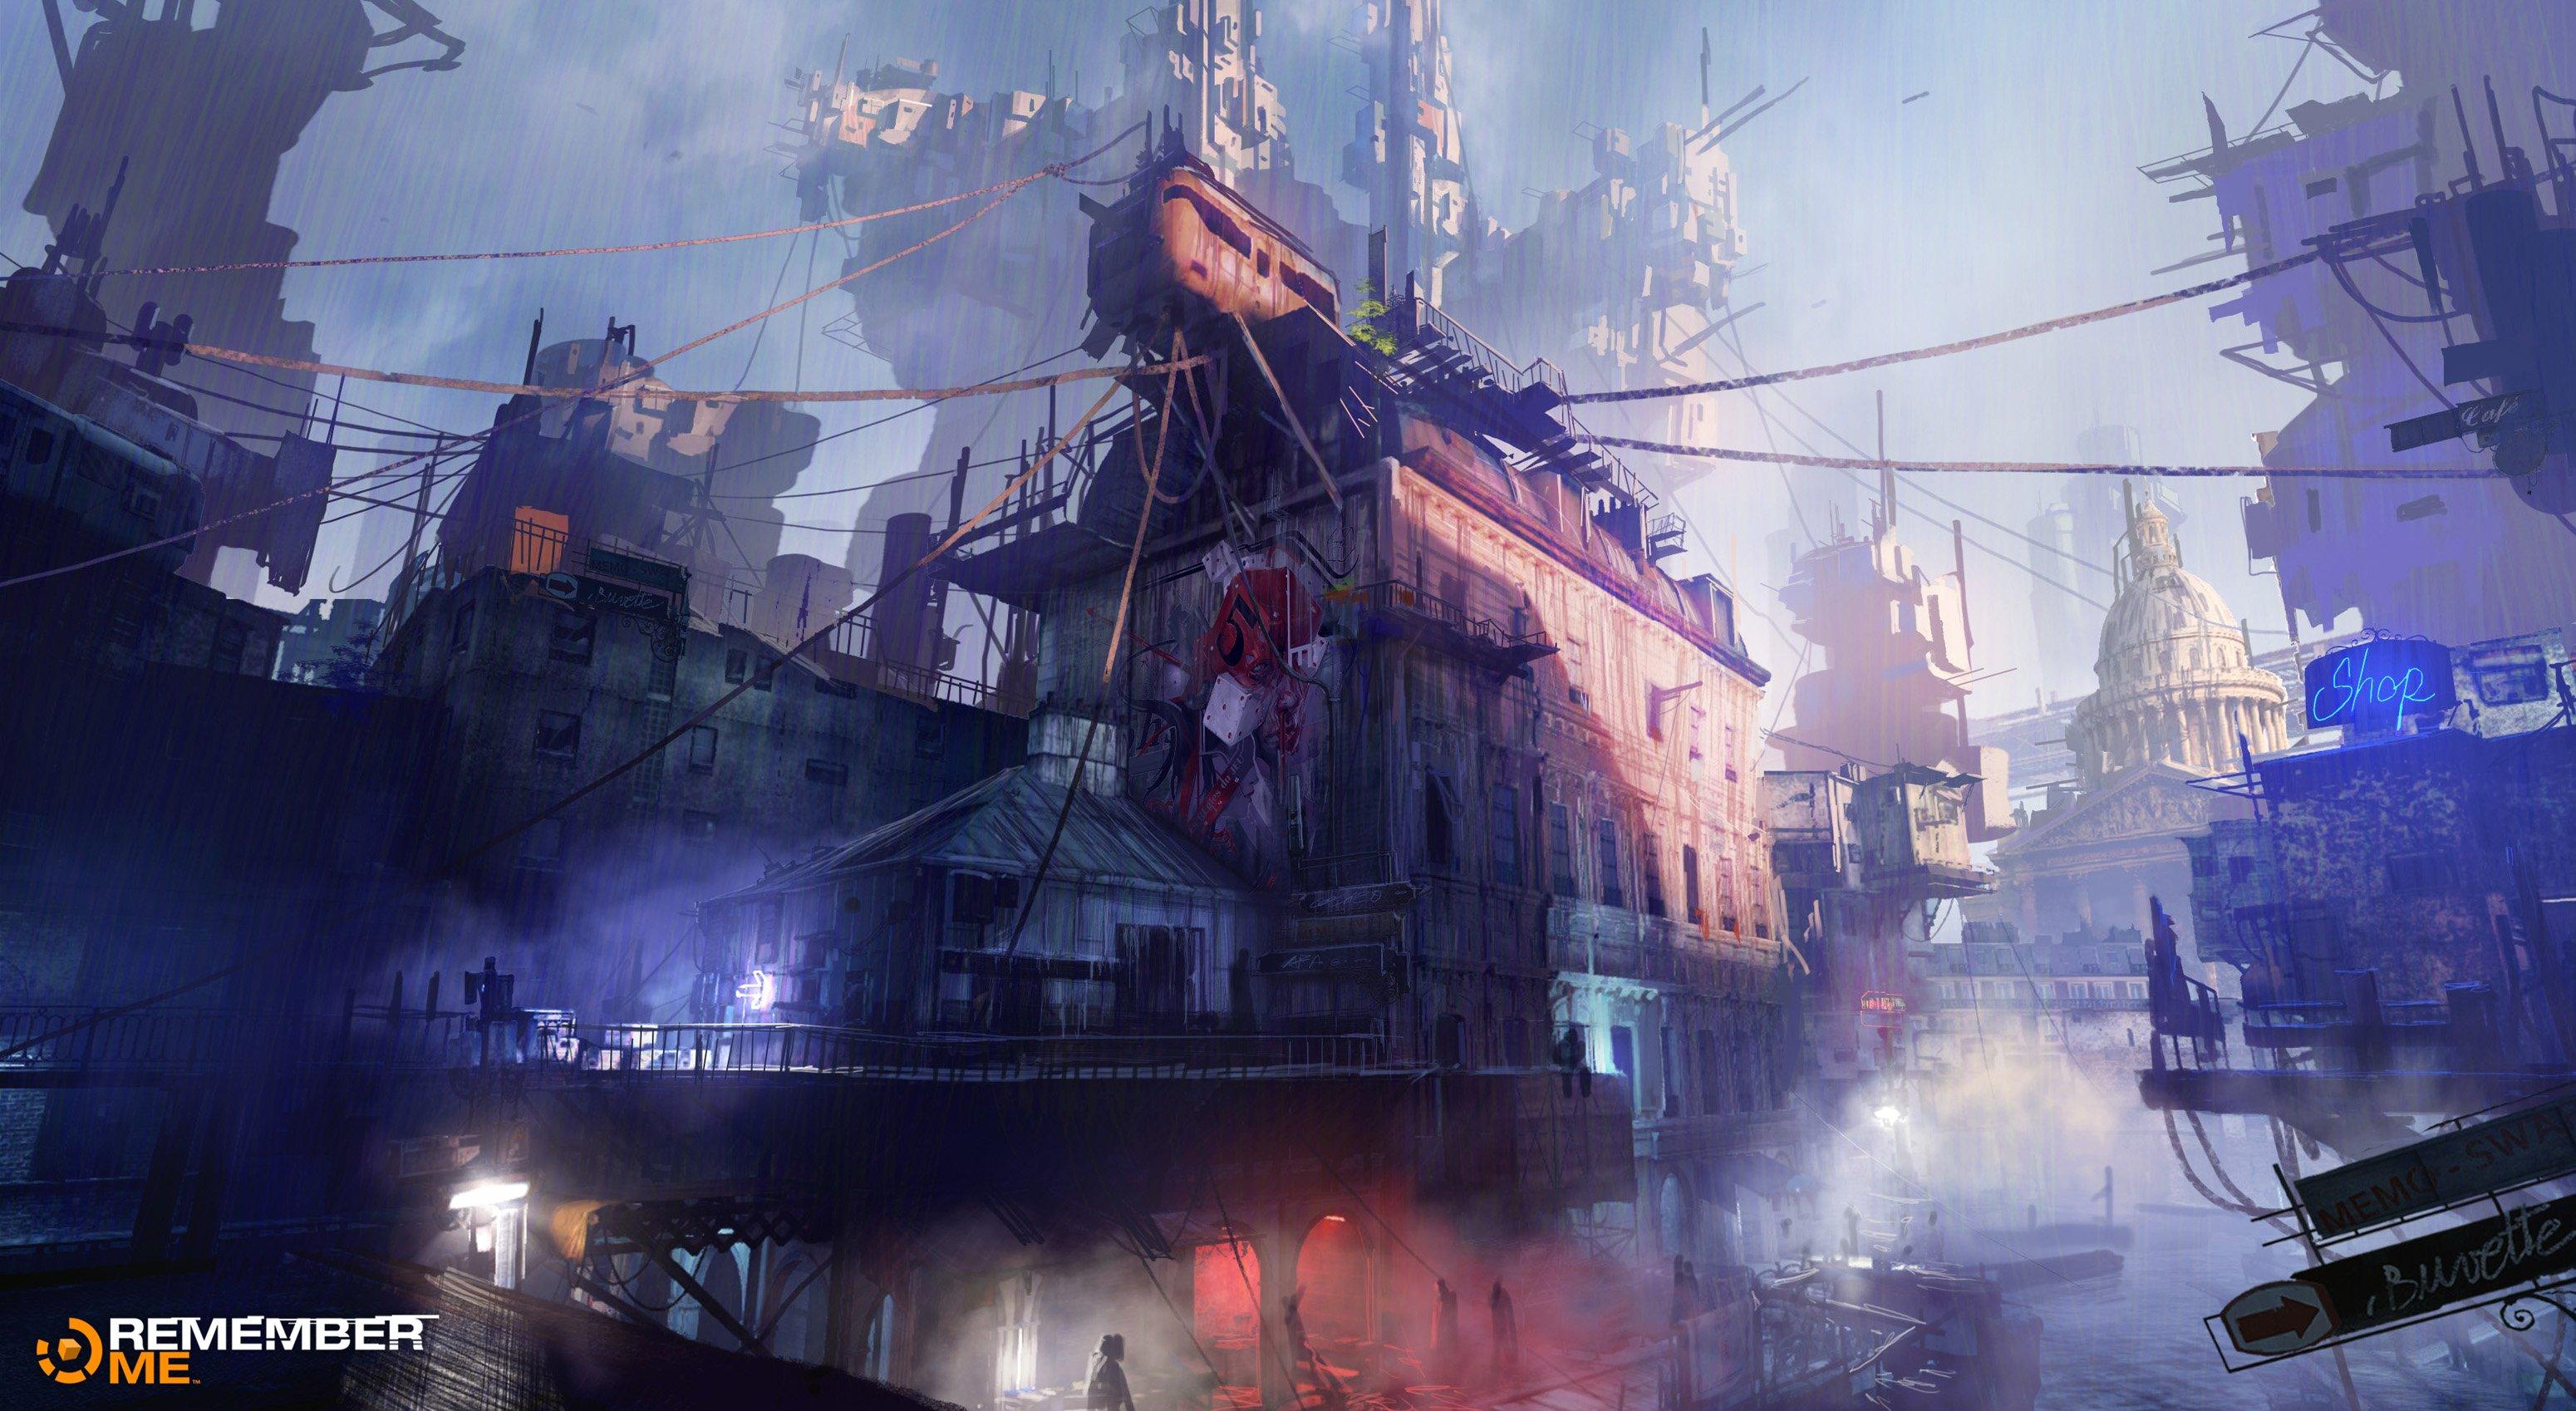 Remember Me Action Adventure Sci Fi Futuristic 18